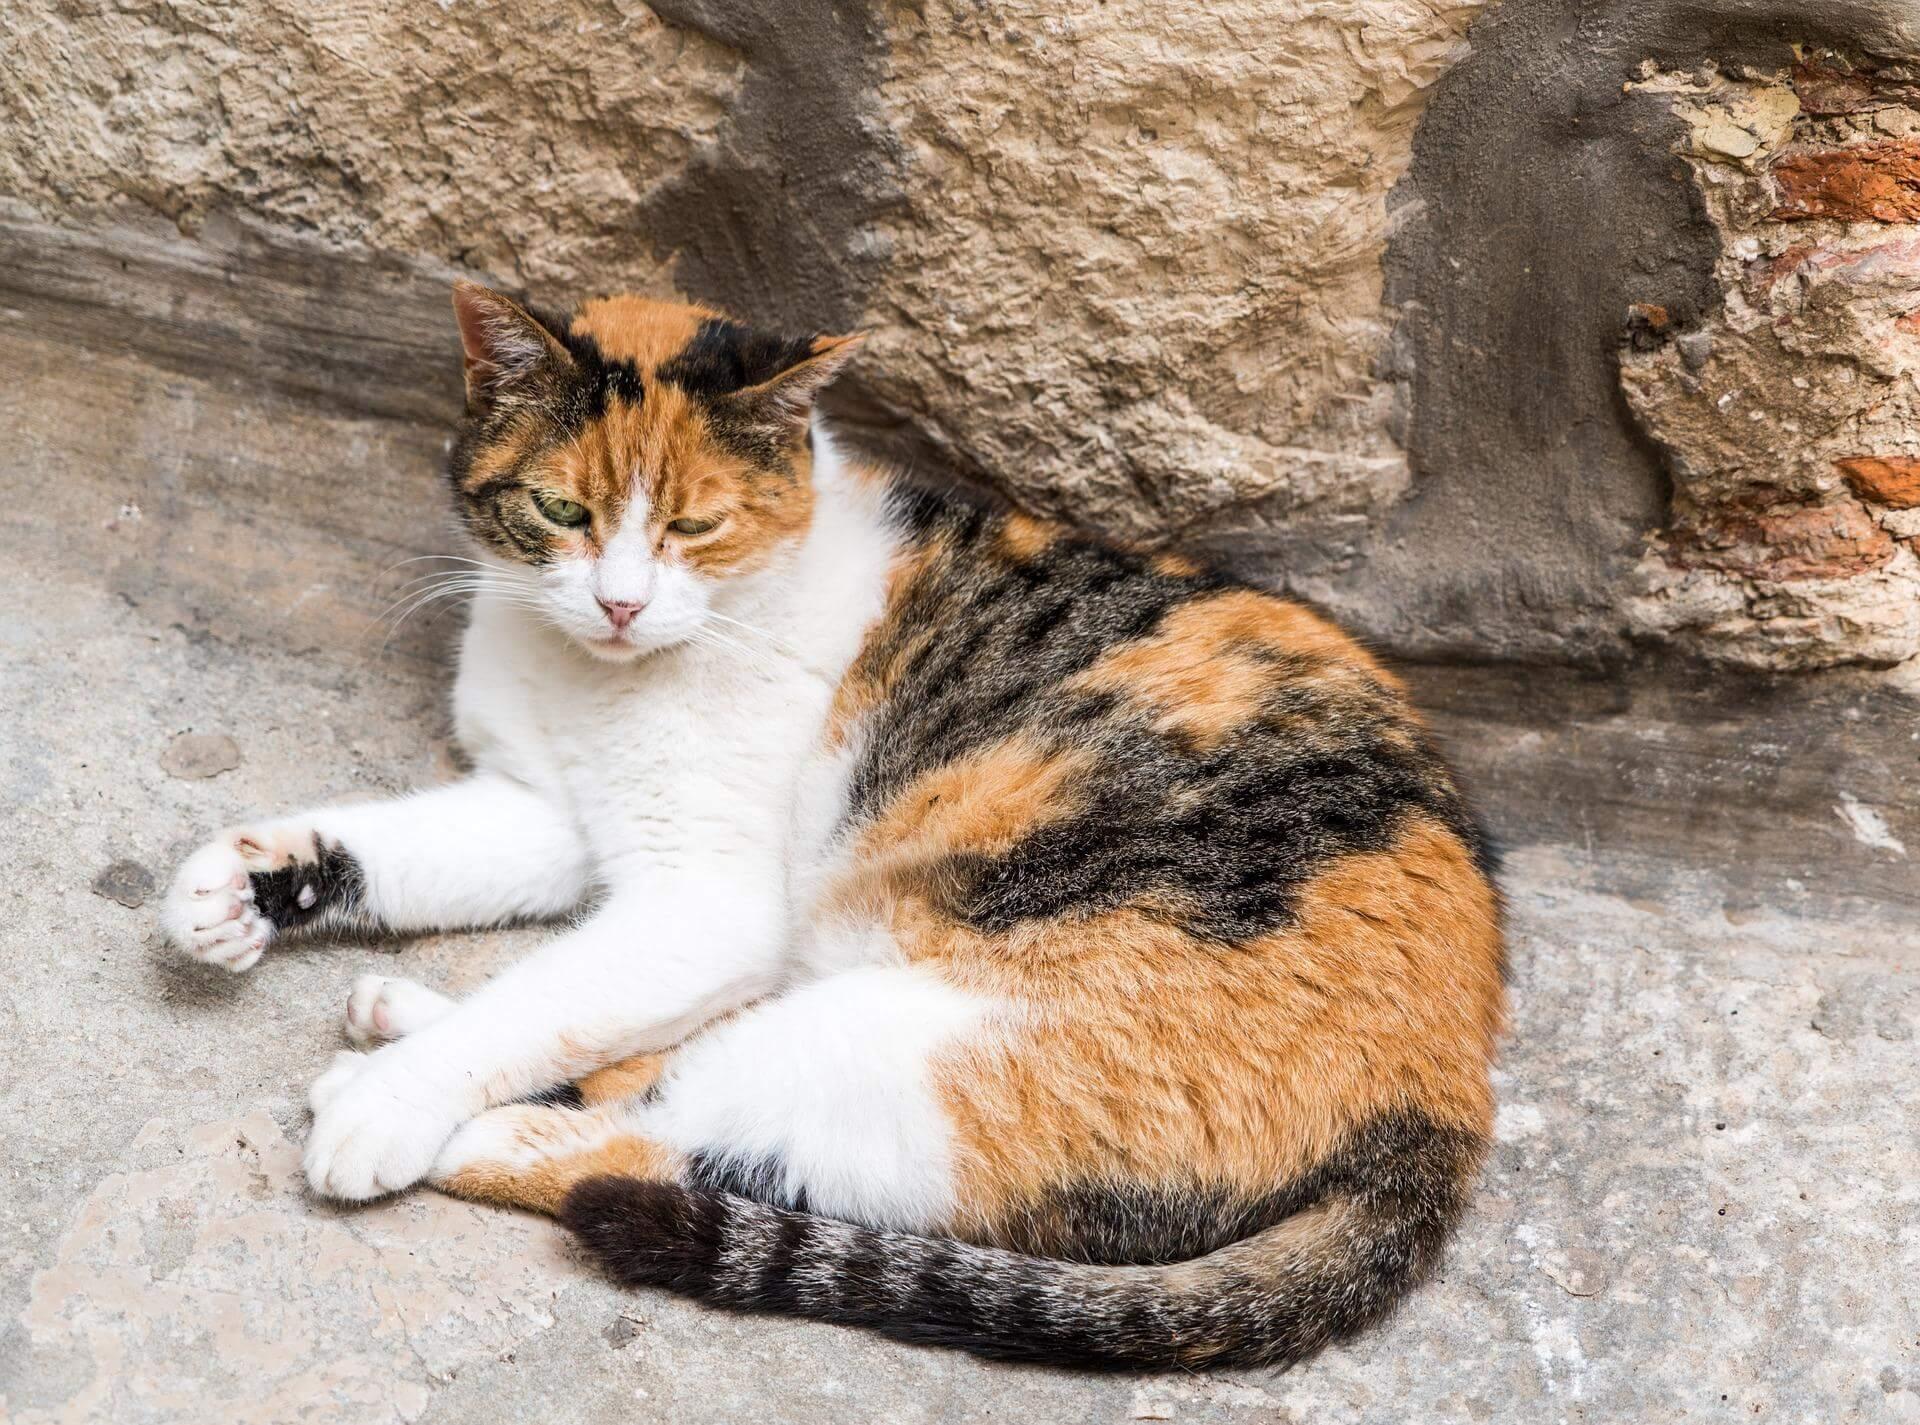 usia kucing kembang telon cukup panjang